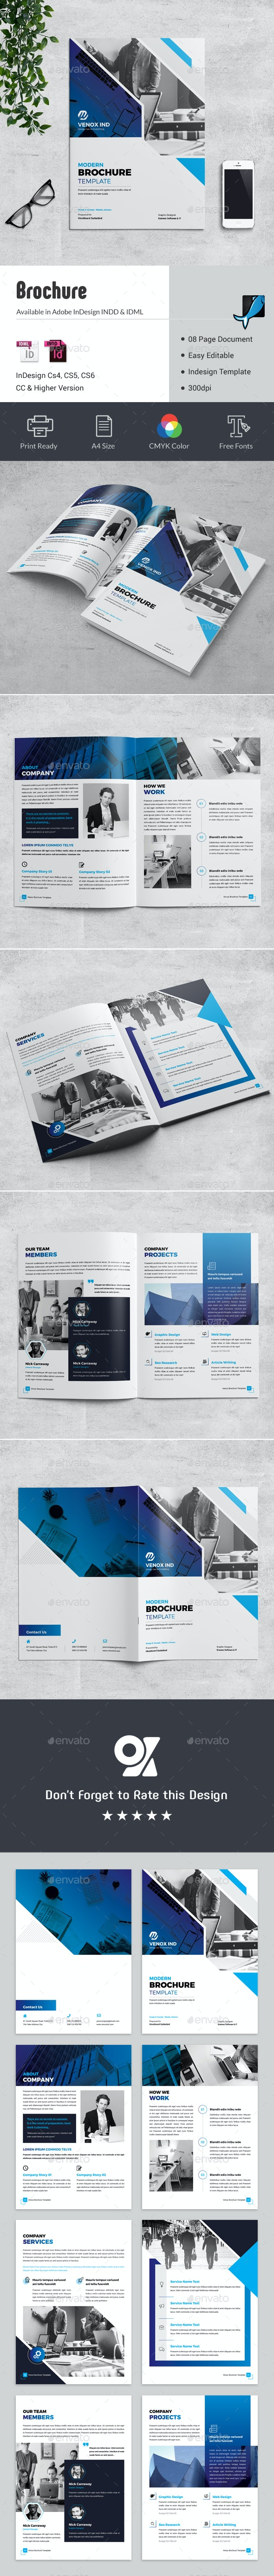 08 Pages Brochure - Corporate Brochures